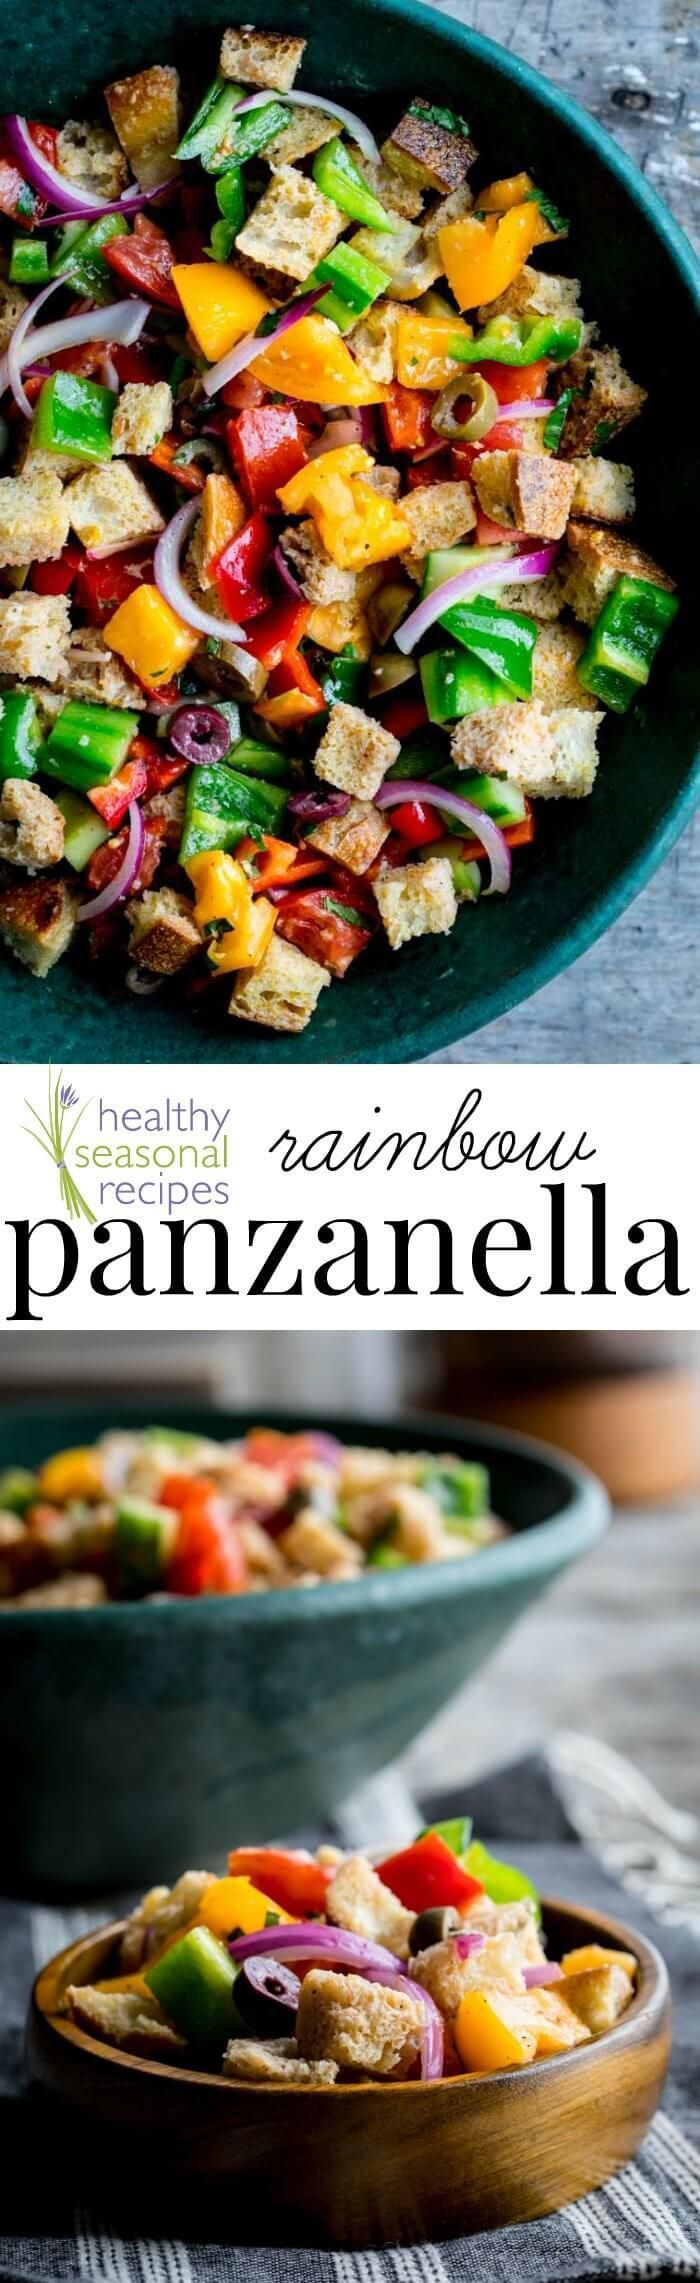 Rainbow panzanella –